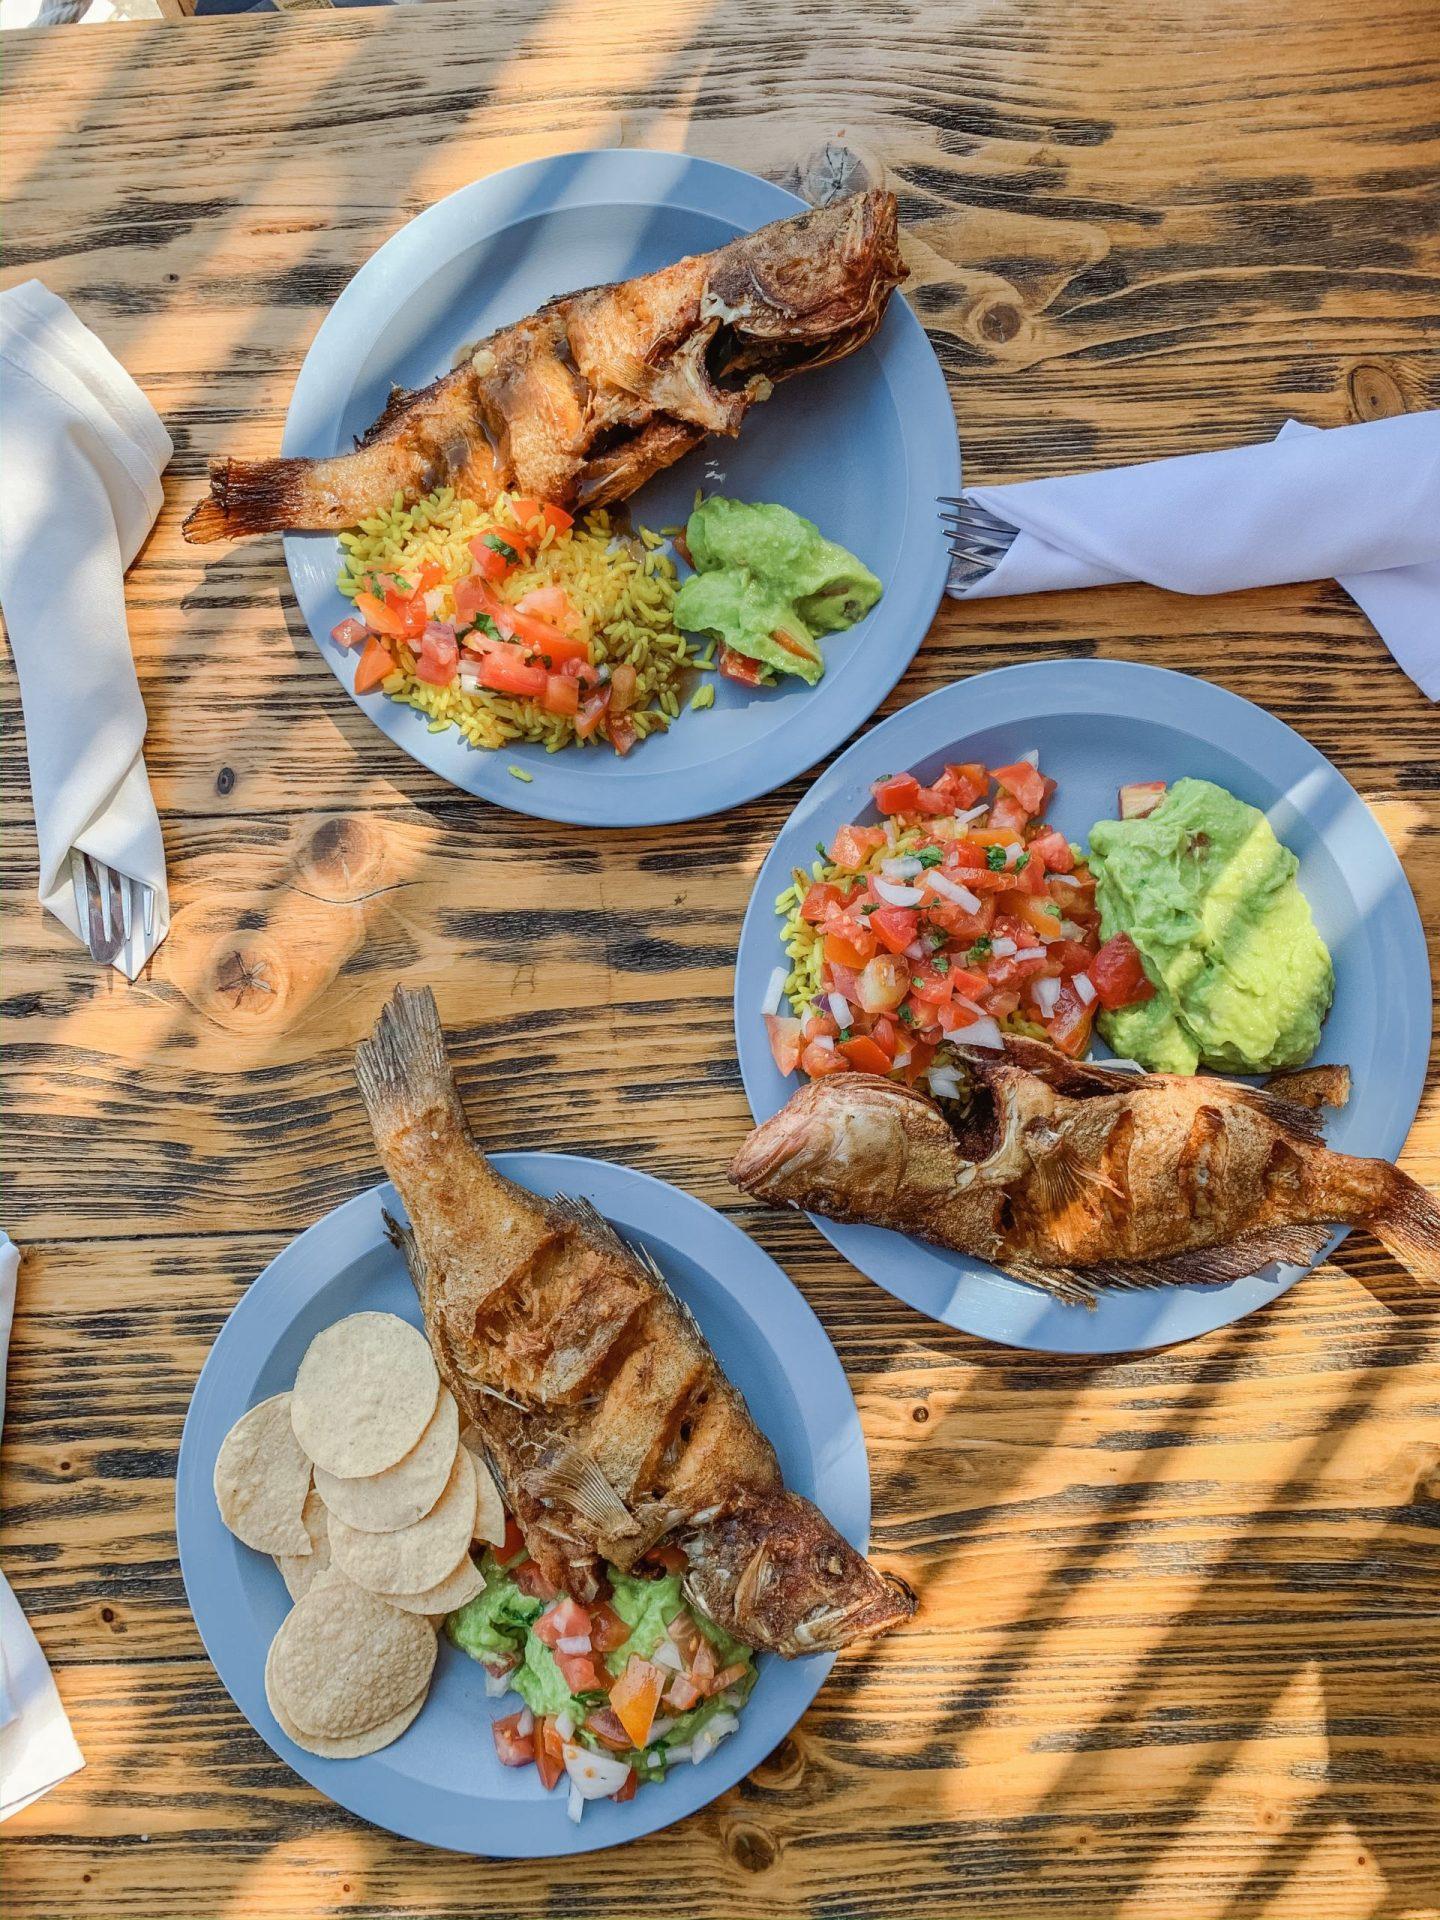 Ocean Riviera Paradise, All Inclusive Food Review - Pez Vella Restaurant